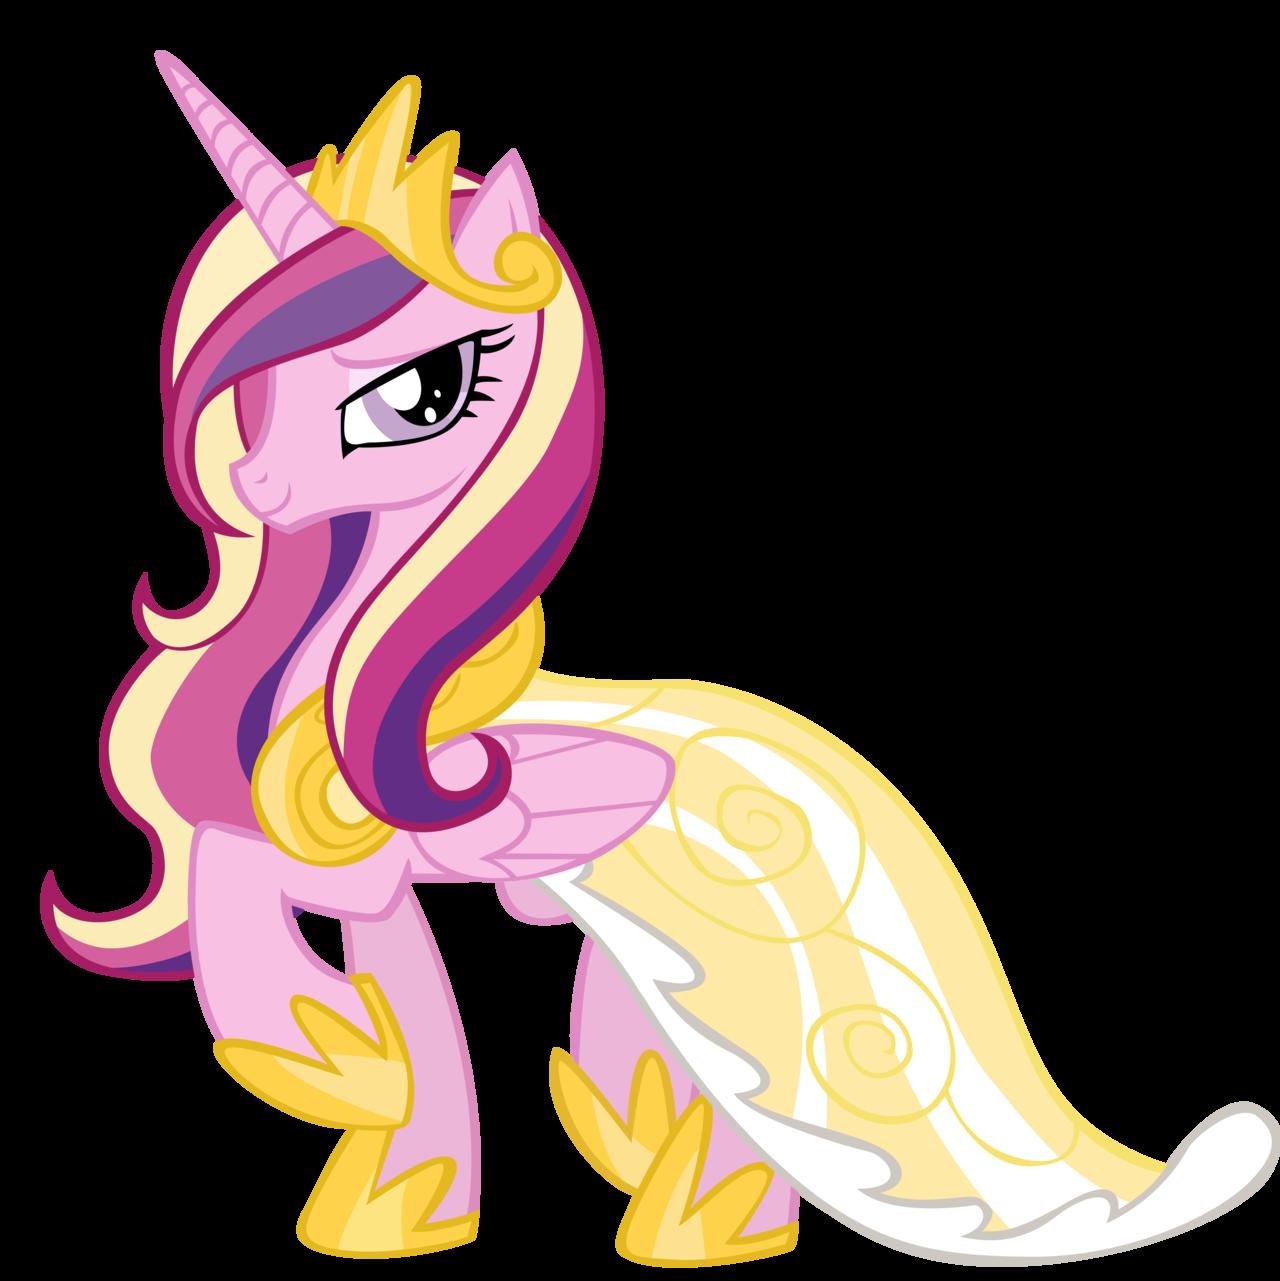 Princess cadence fallout equestria wiki - Pictures of princess cadence ...